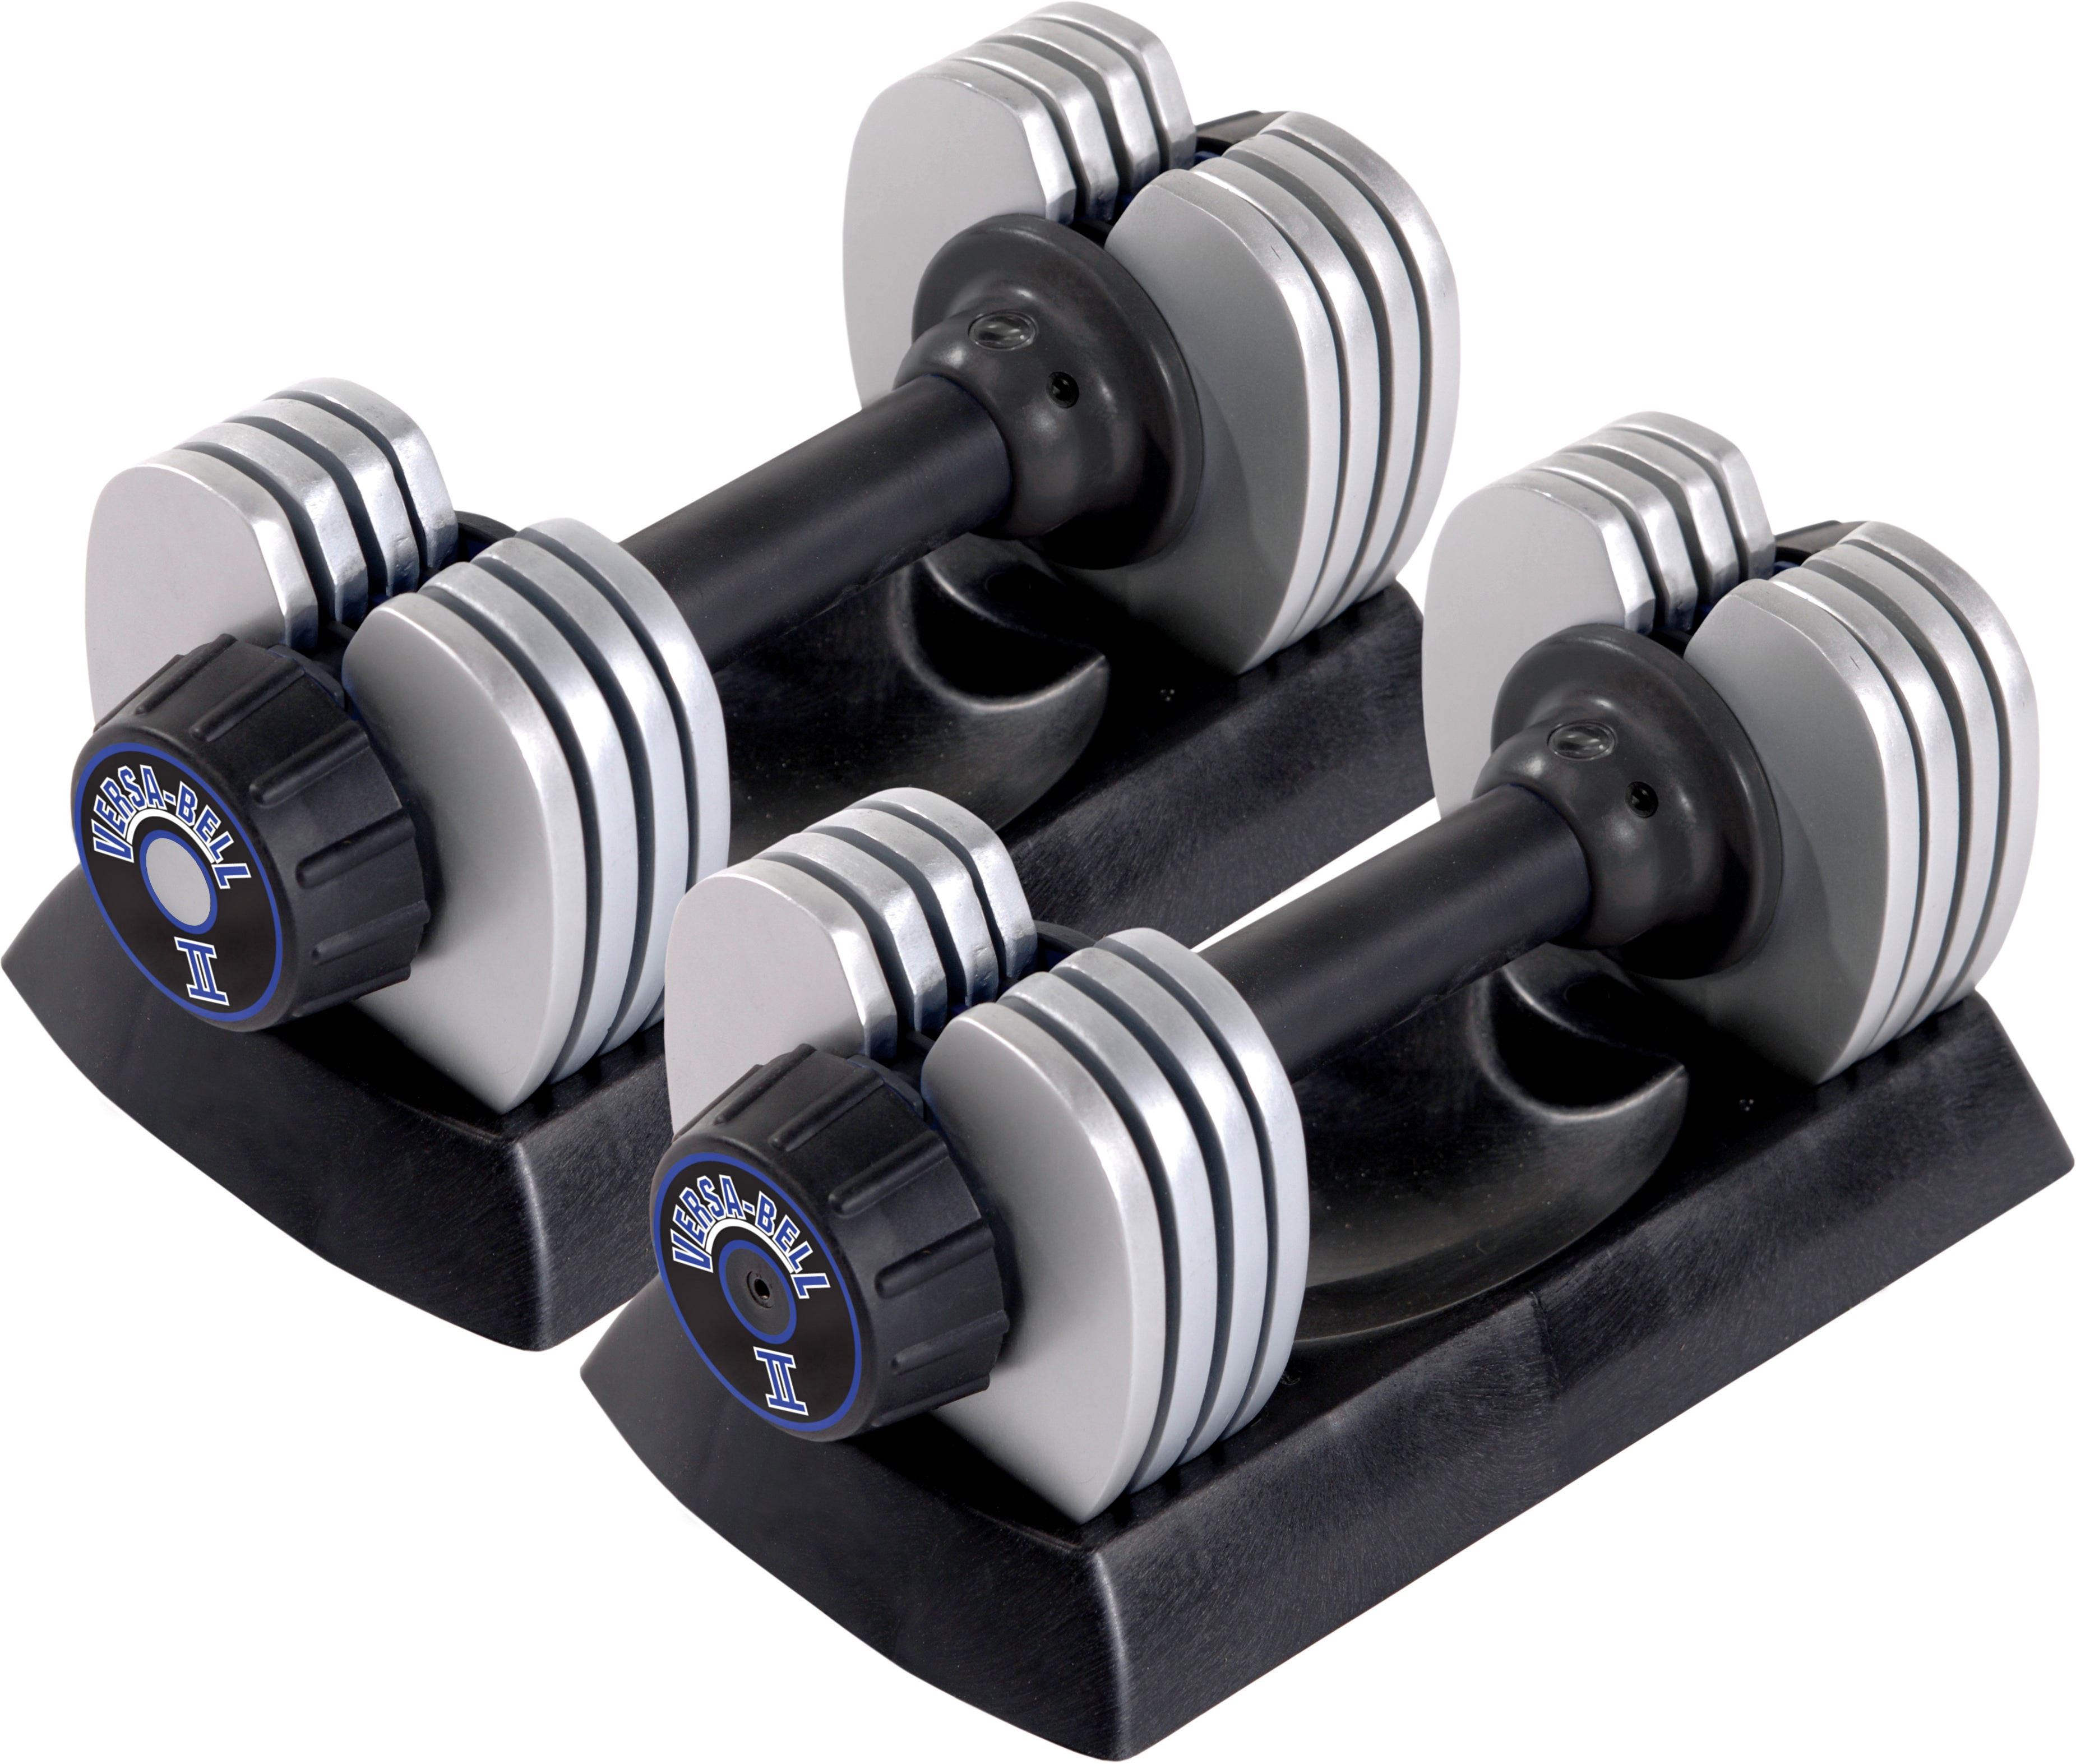 Stamina 25-pound Versa Bell II Adjustable Dumbbells (Set of 2)